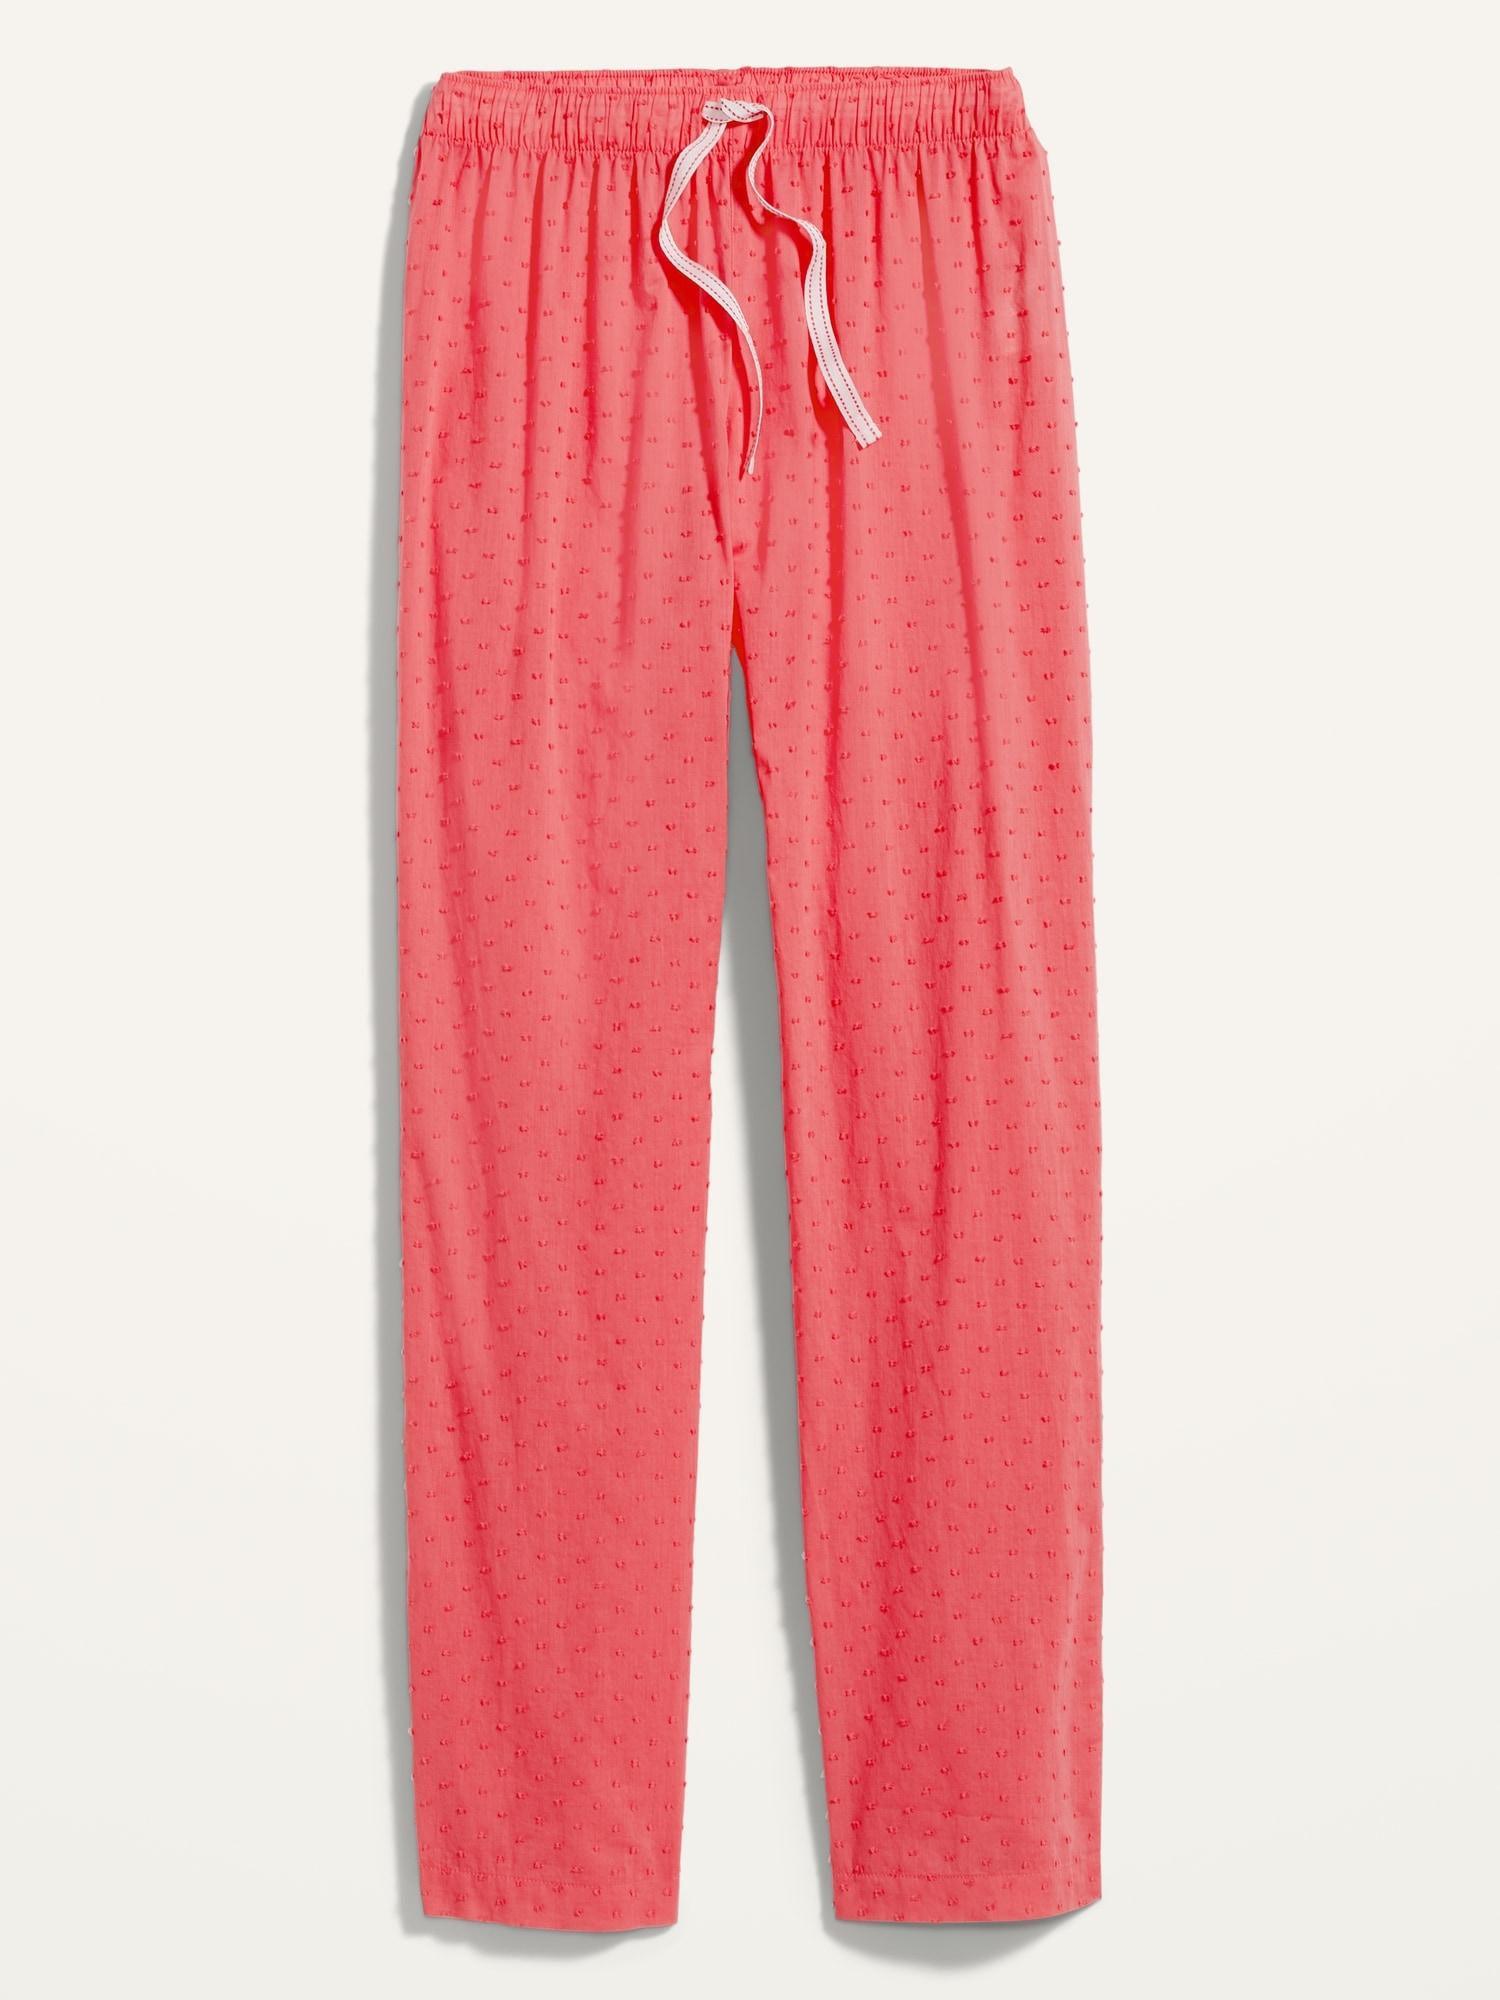 Old Navy Textured Swiss-Dot Pajama Pants for Women